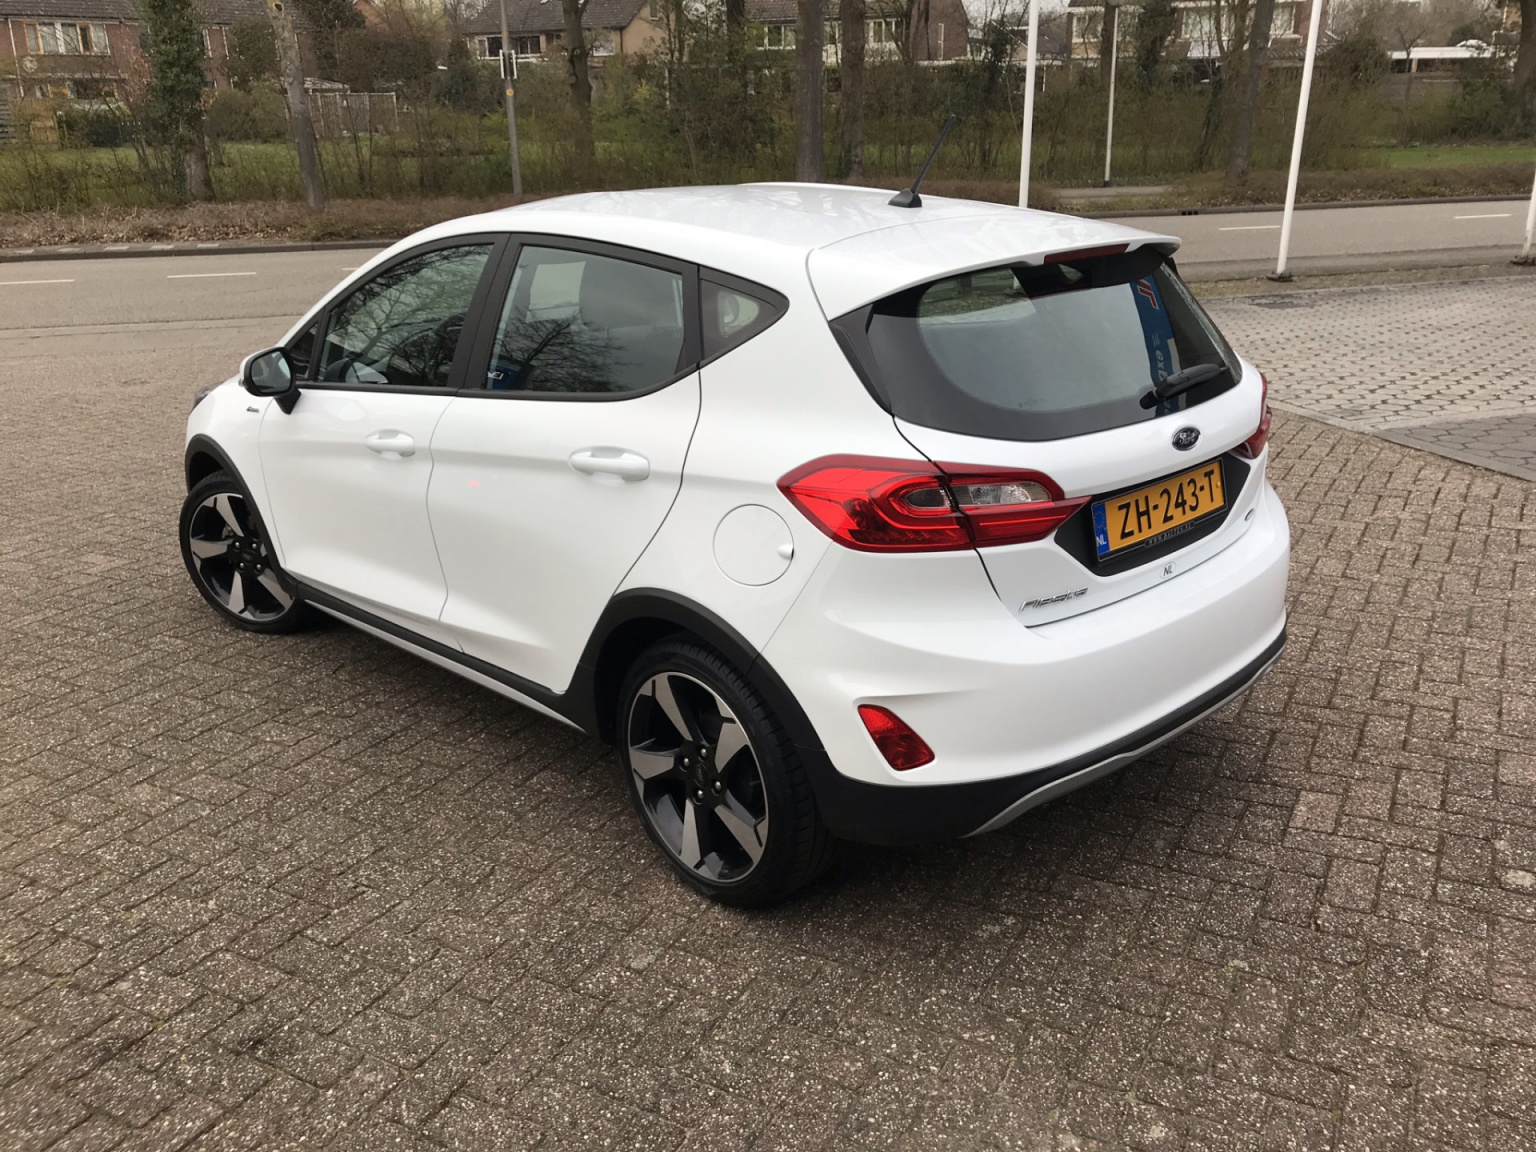 Ford-Fiesta-33